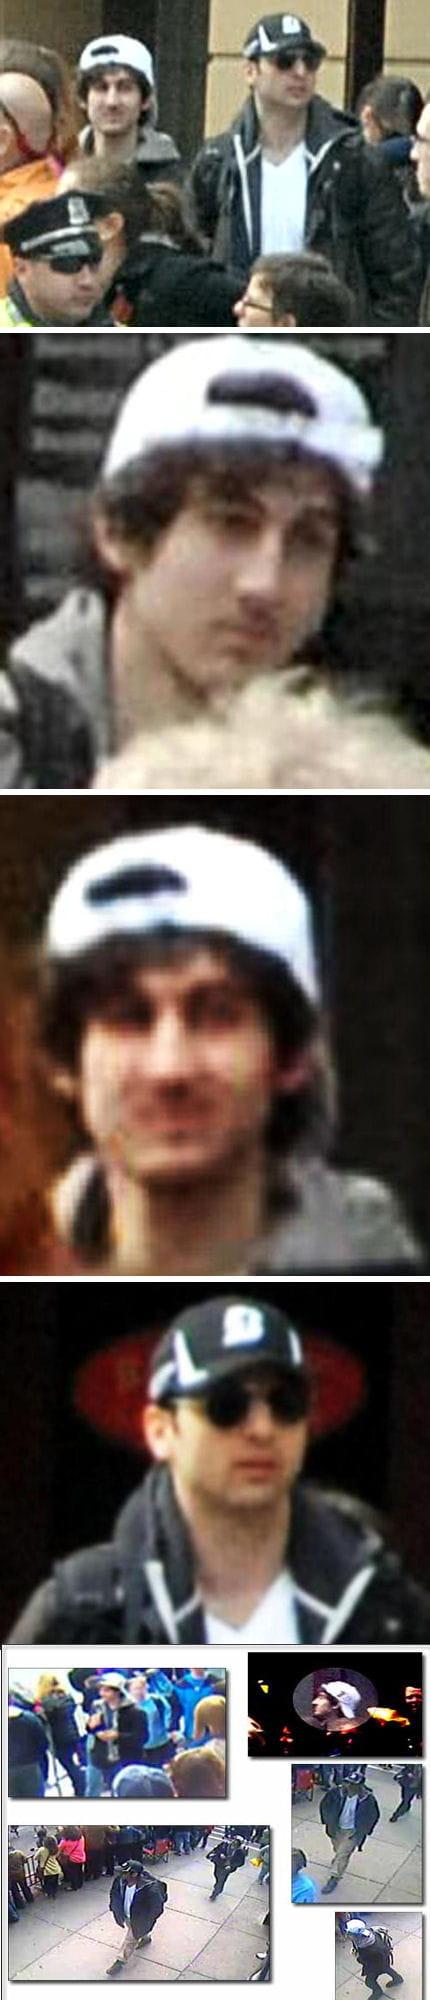 suspects boston photos